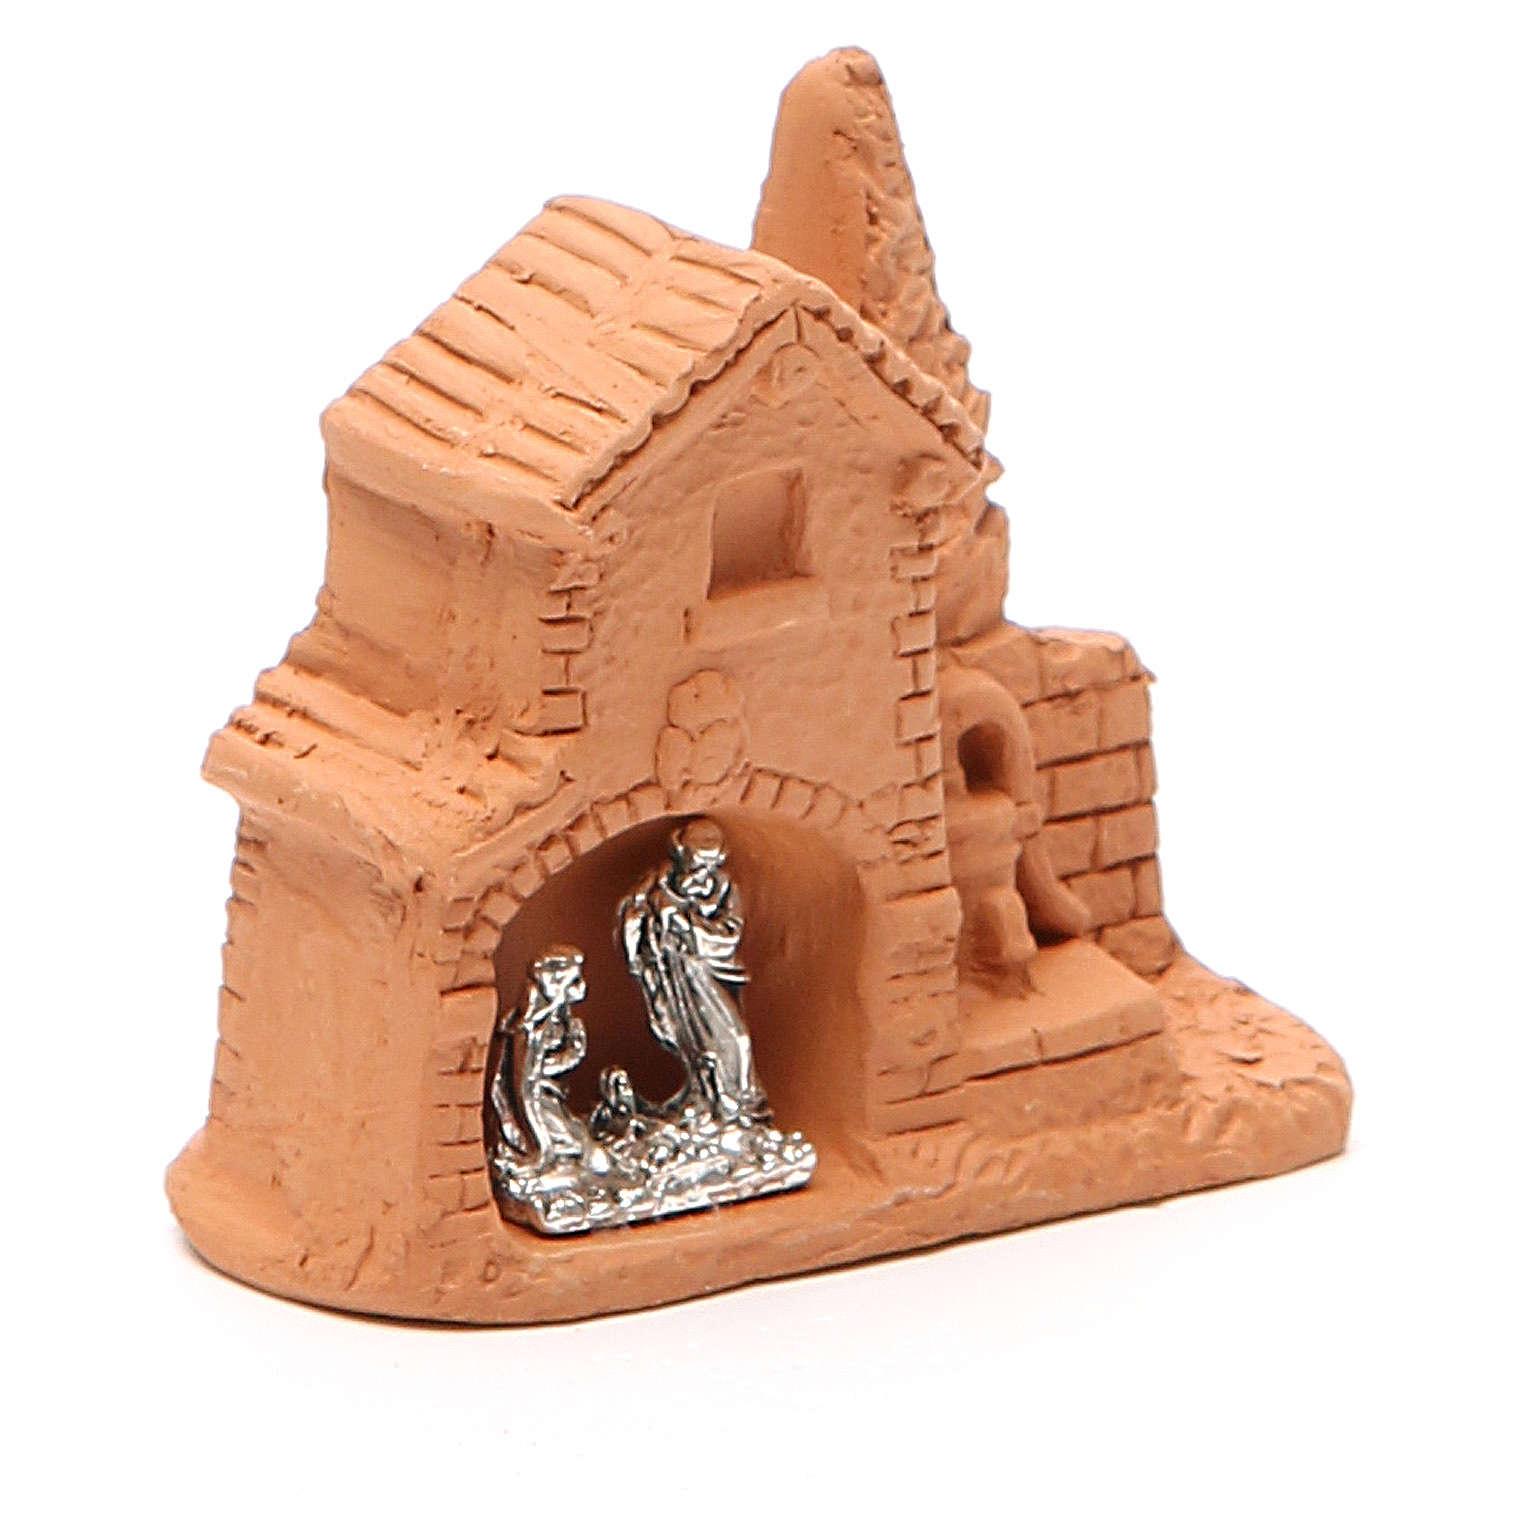 Capanna e natività miniatura terracotta naturale 6x7x3 cm 4